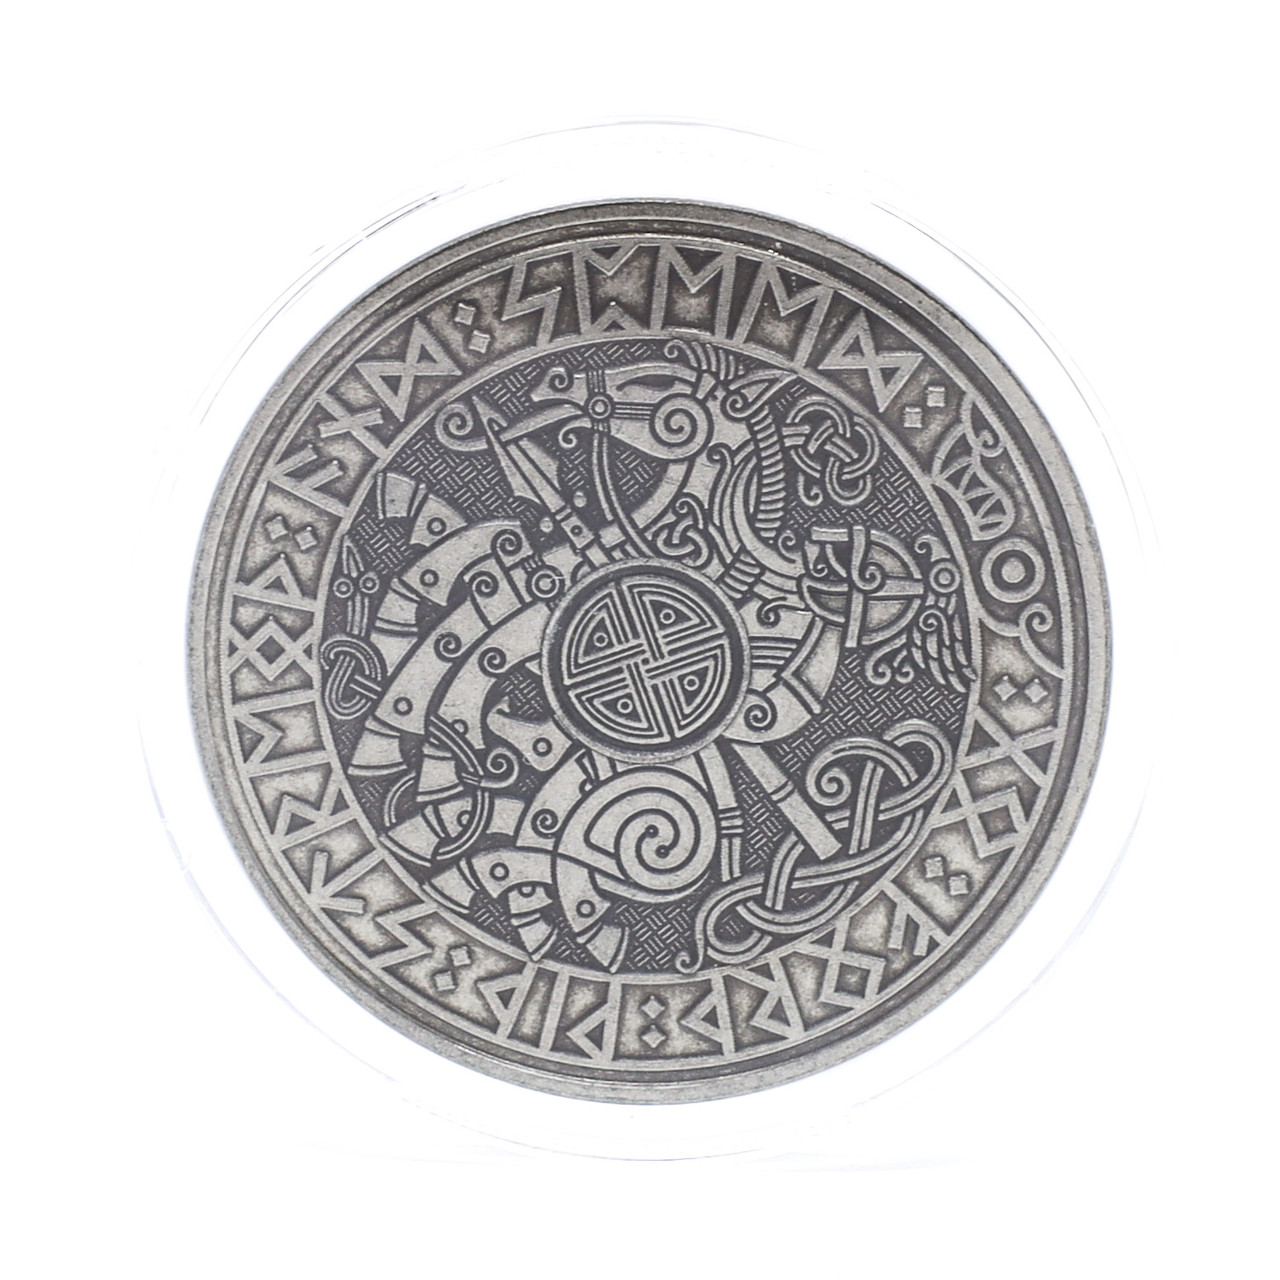 Carpe Diem Viking Travel Coin ANS Antique Nickel Finish